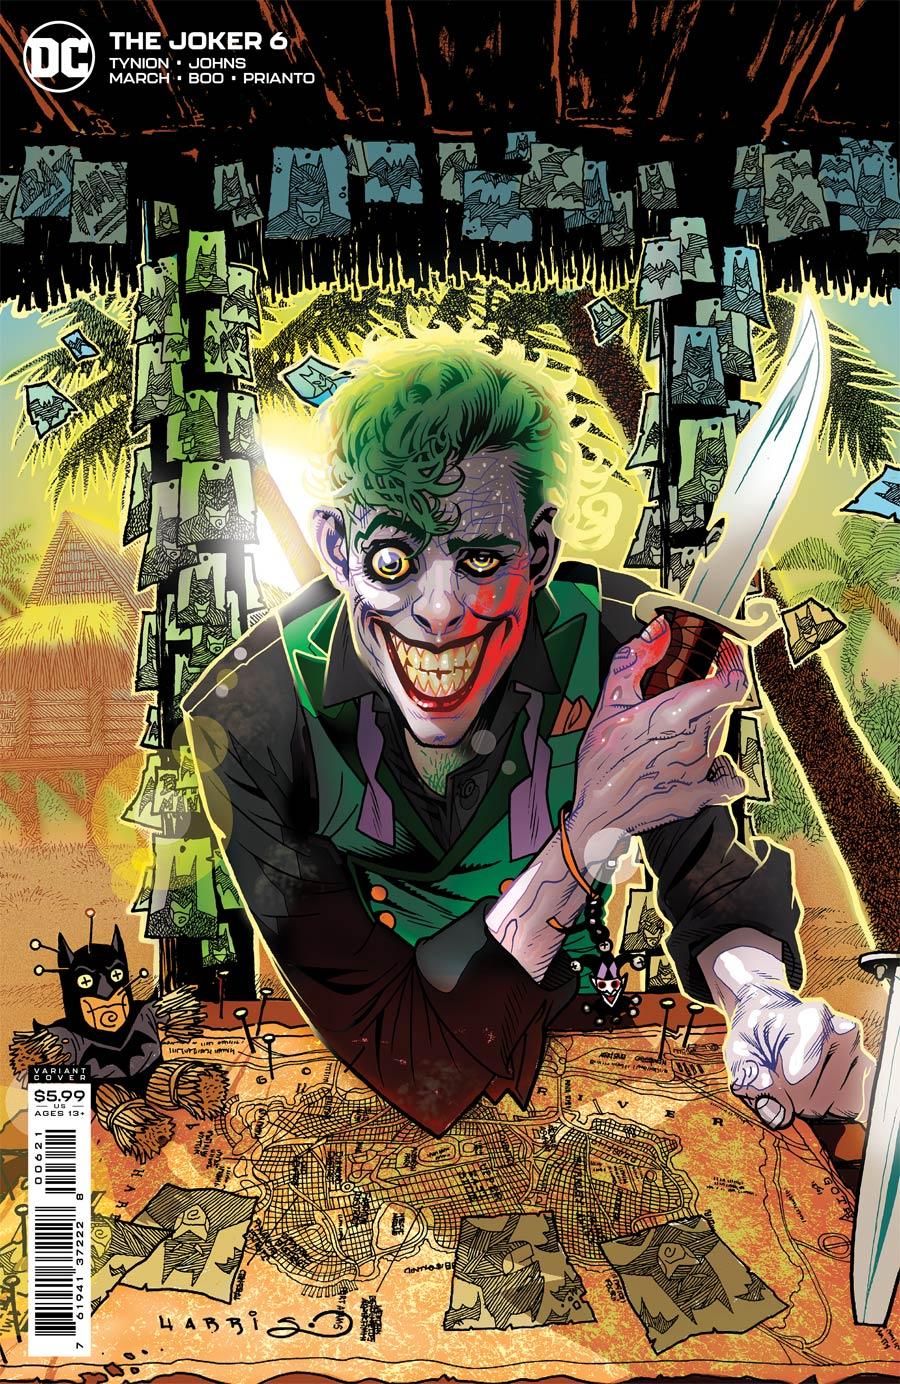 Joker Vol 2 #6 Cover B Variant Tony Harris Cover